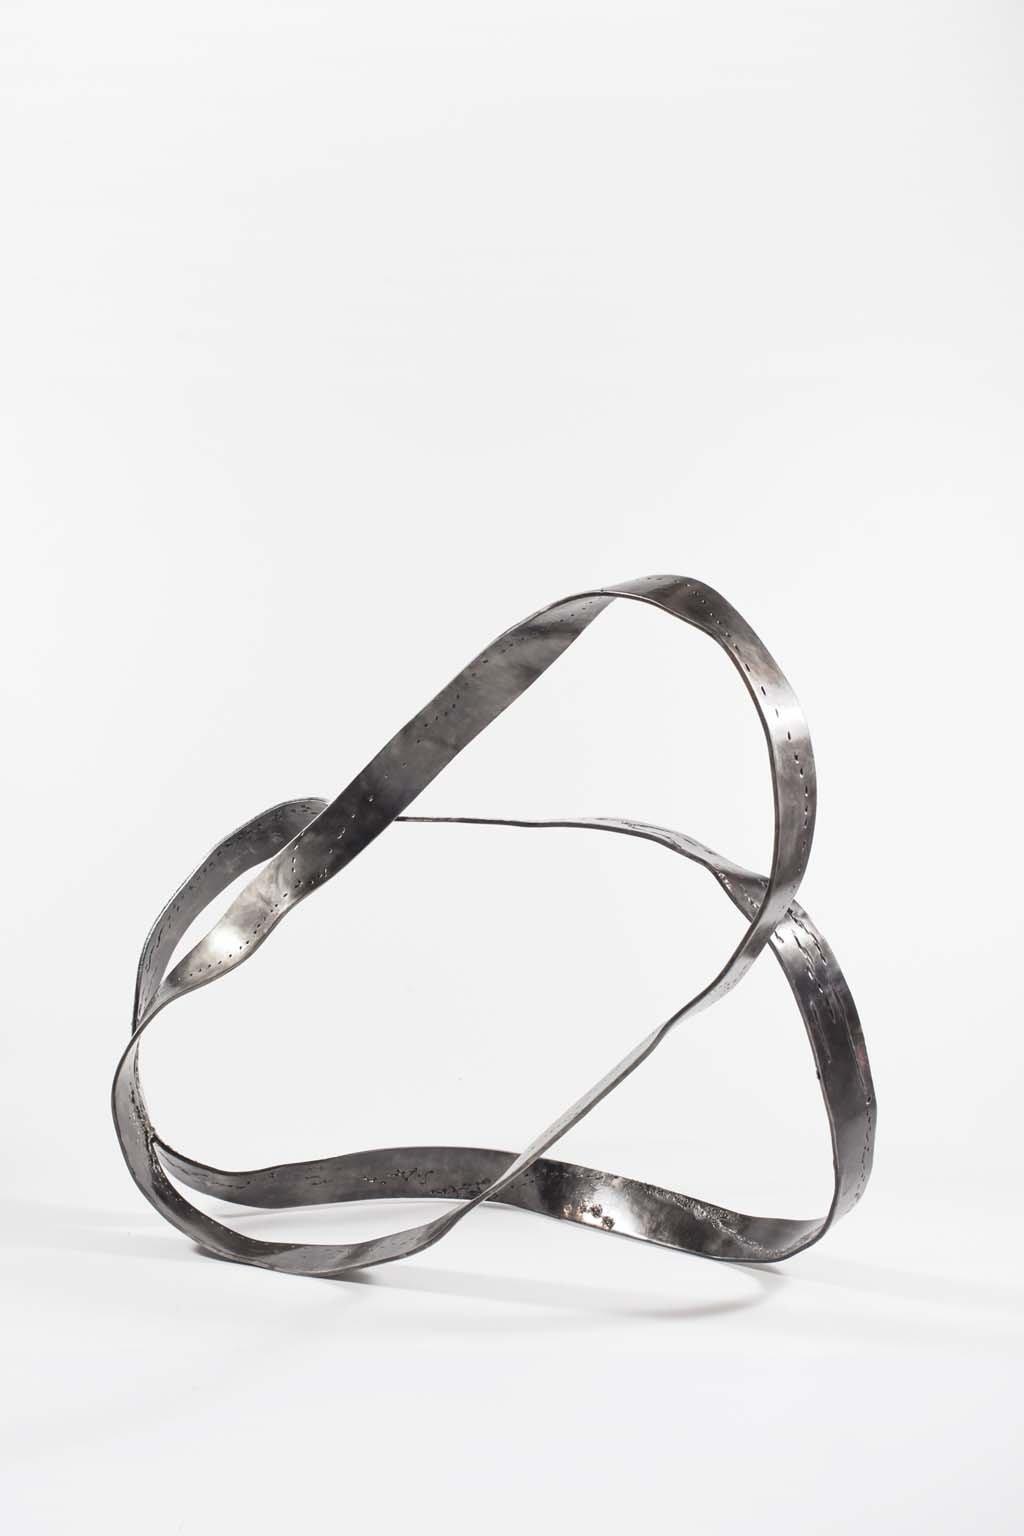 Oblivion I   2015 I  Iron & brass sculpture   Rami Ater   רמי אטר